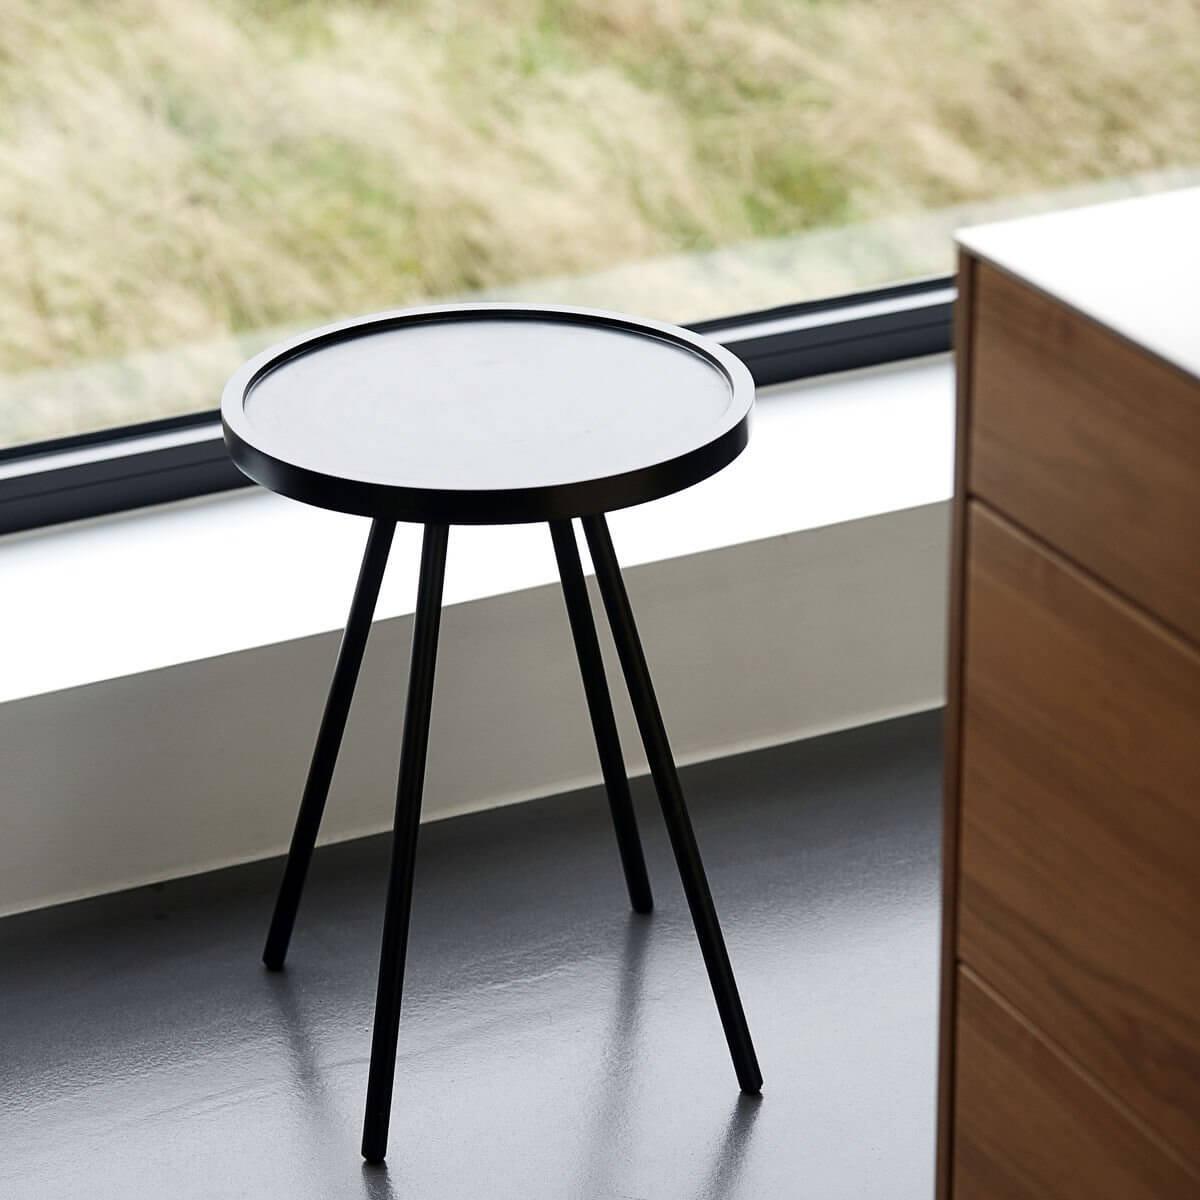 Mango Wood Side Table